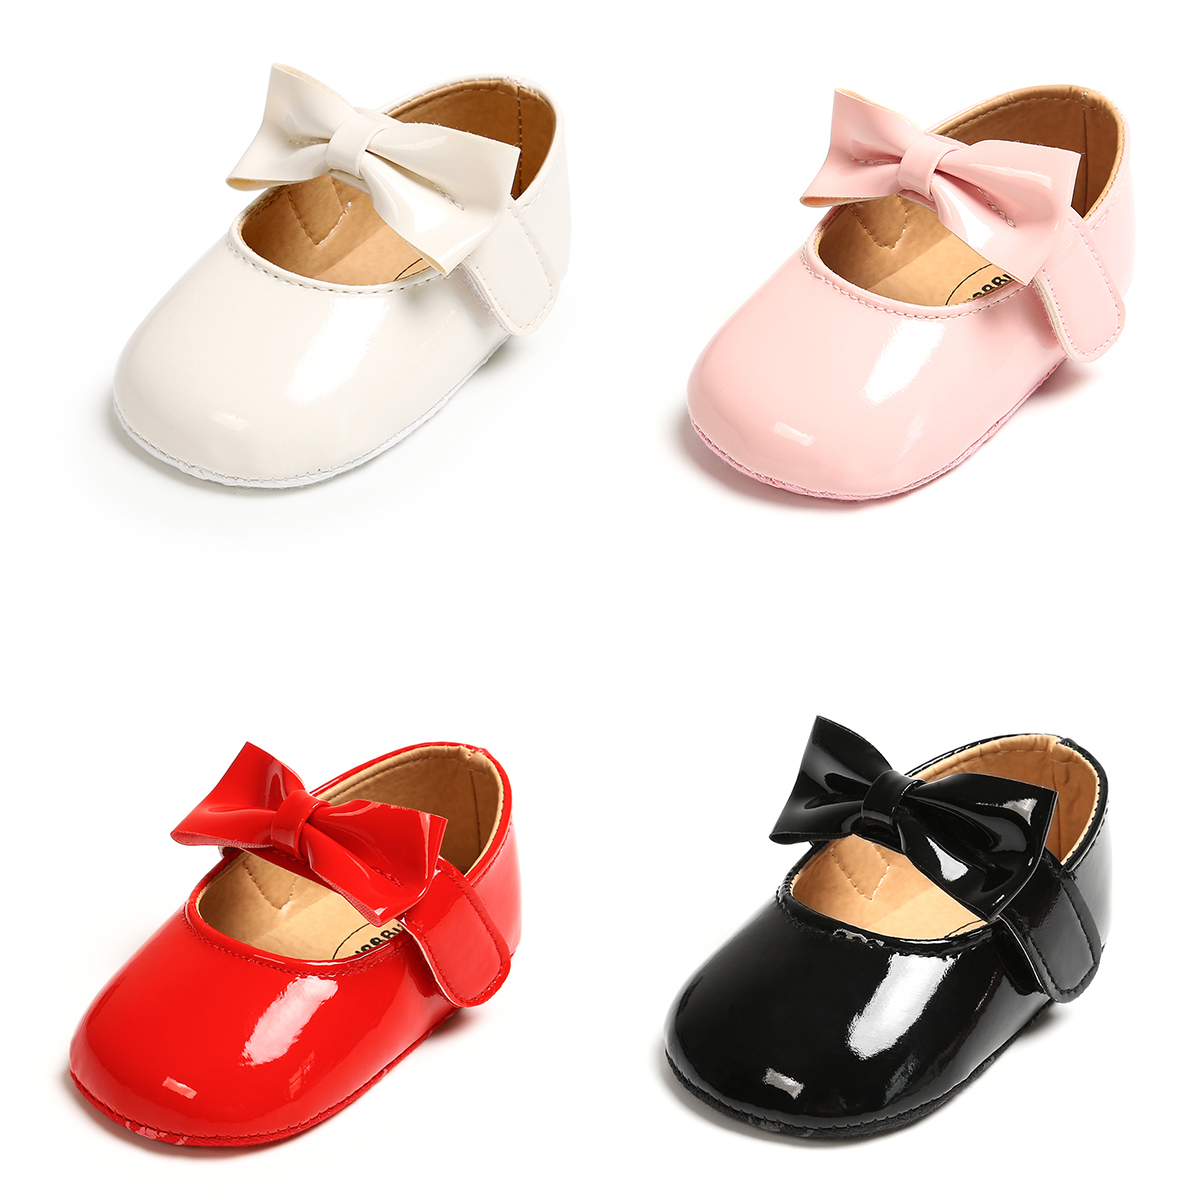 Newborn Baby Girls Shoes PU leather